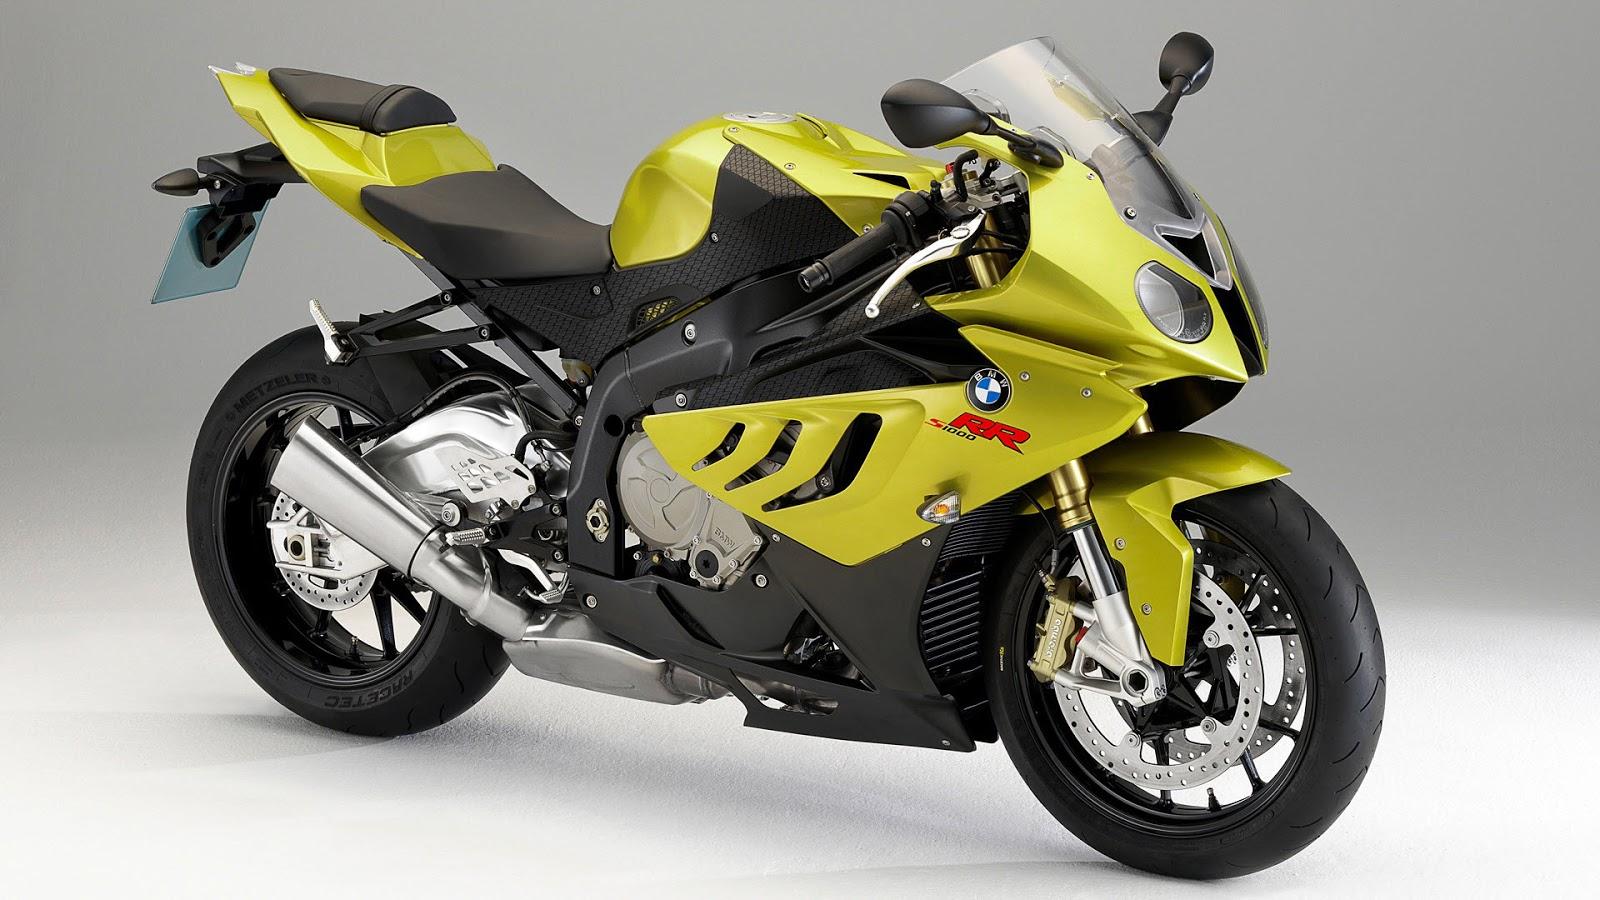 CARS SPORTS BIKES Top Ten Super Cool Sports Bikes HD Wallpapers 1600x900